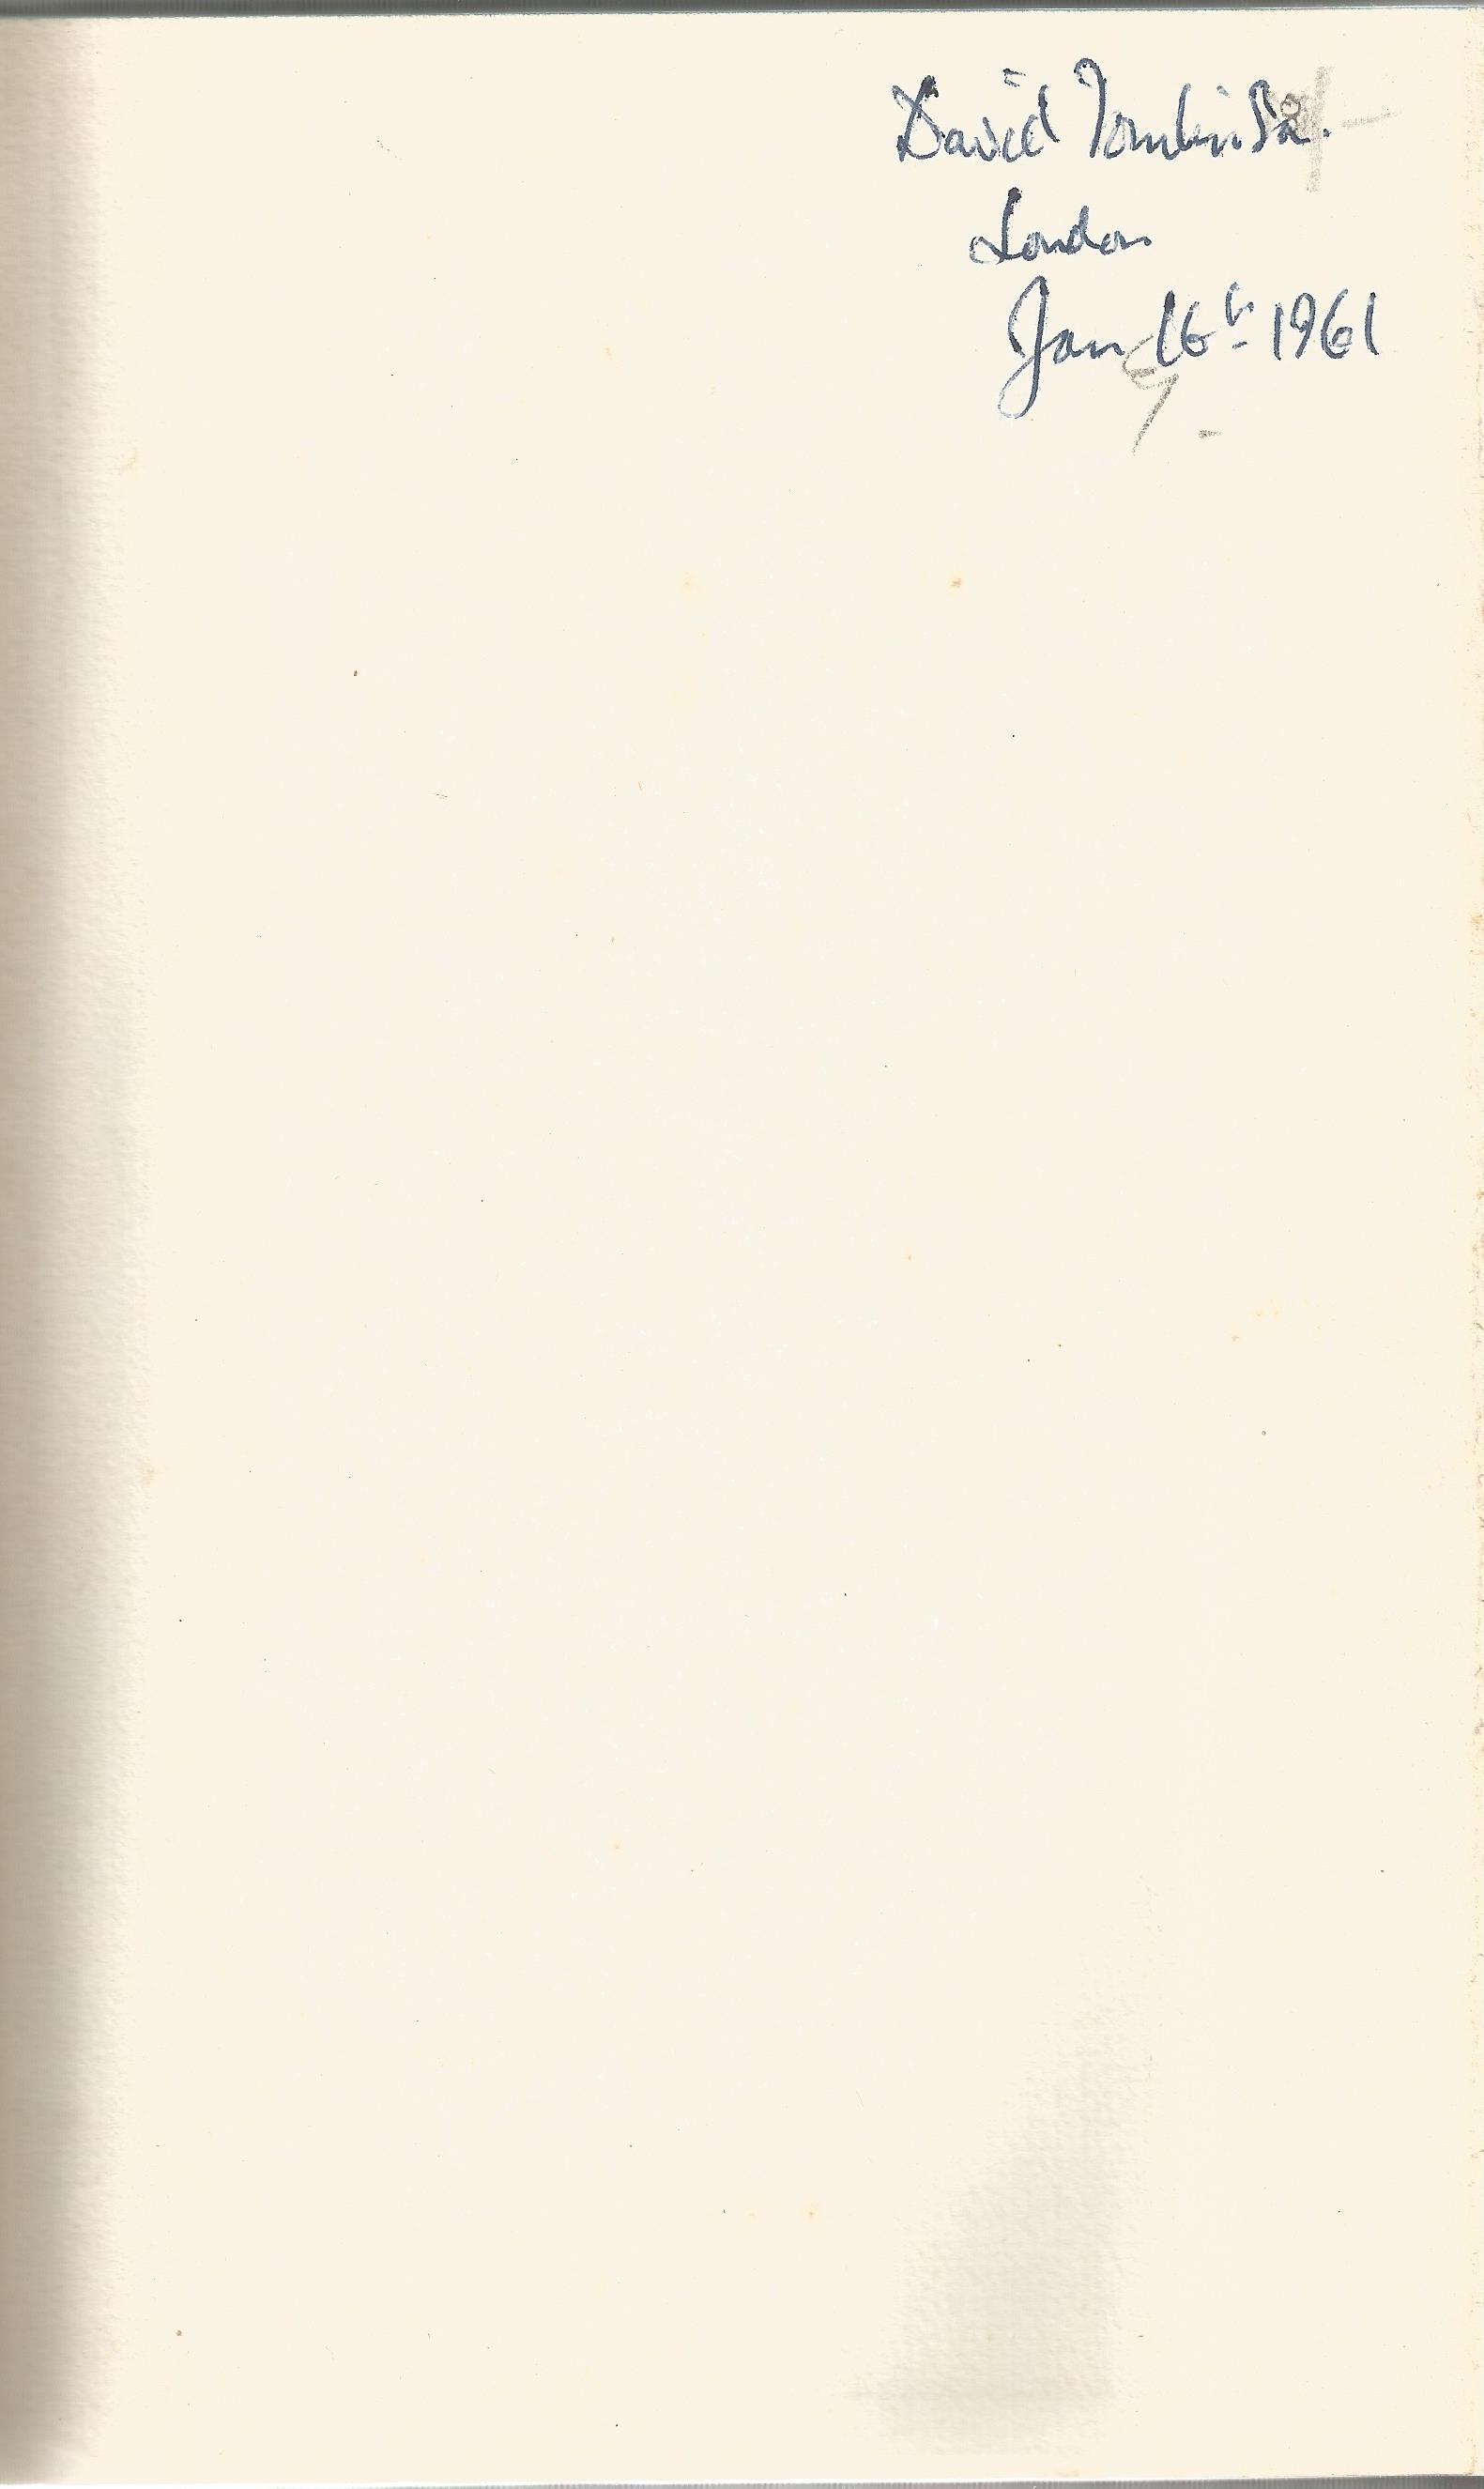 Hardback Book John Milton Poems L'Allegro, Il Penseroso, Comus Lycidas published by The Peter Pauper - Image 3 of 3